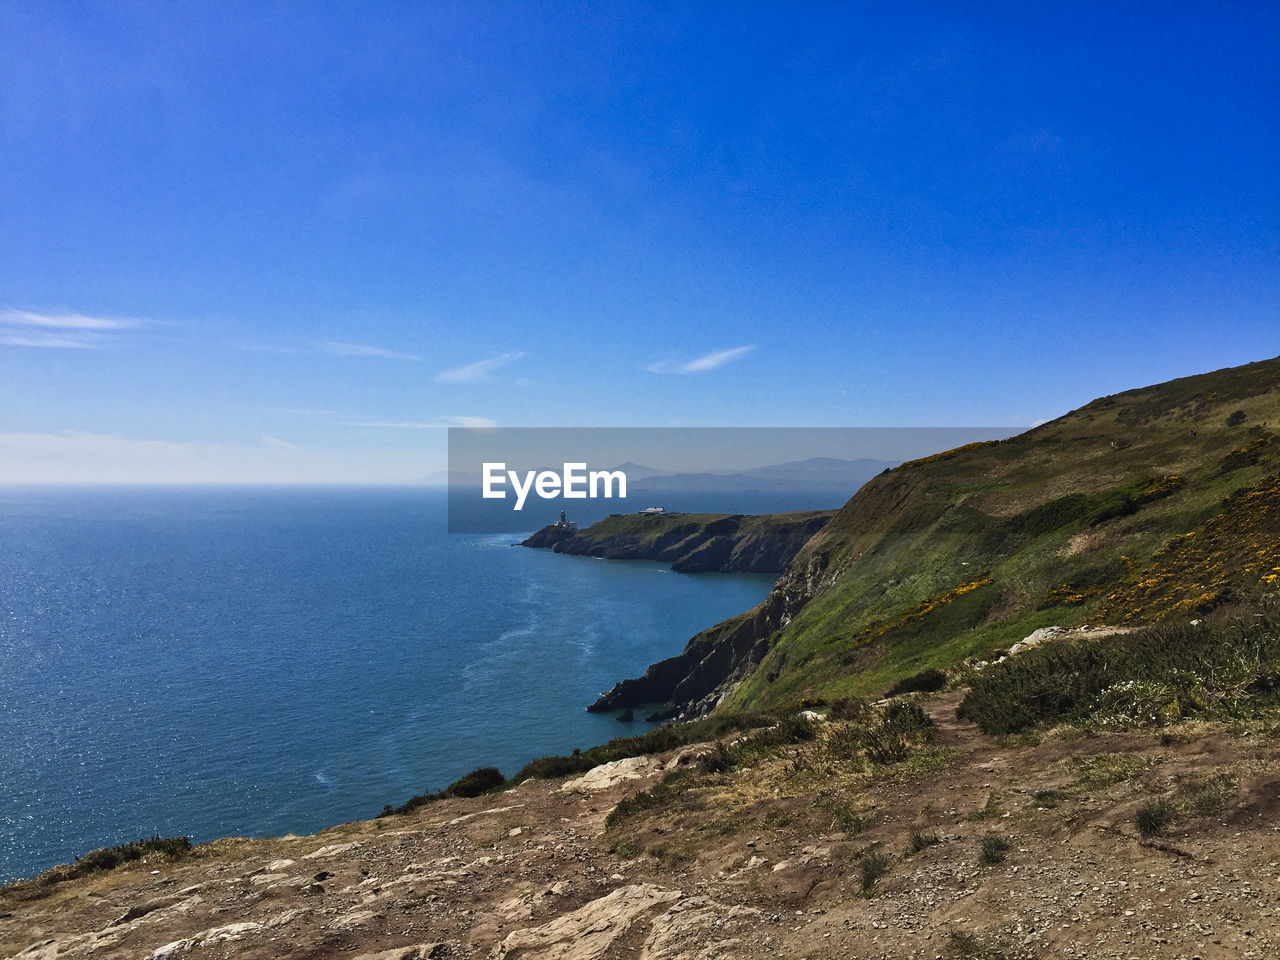 sea, water, sky, scenics - nature, tranquil scene, beauty in nature, blue, tranquility, land, beach, horizon, nature, horizon over water, day, idyllic, no people, non-urban scene, mountain, rock, outdoors, rocky coastline